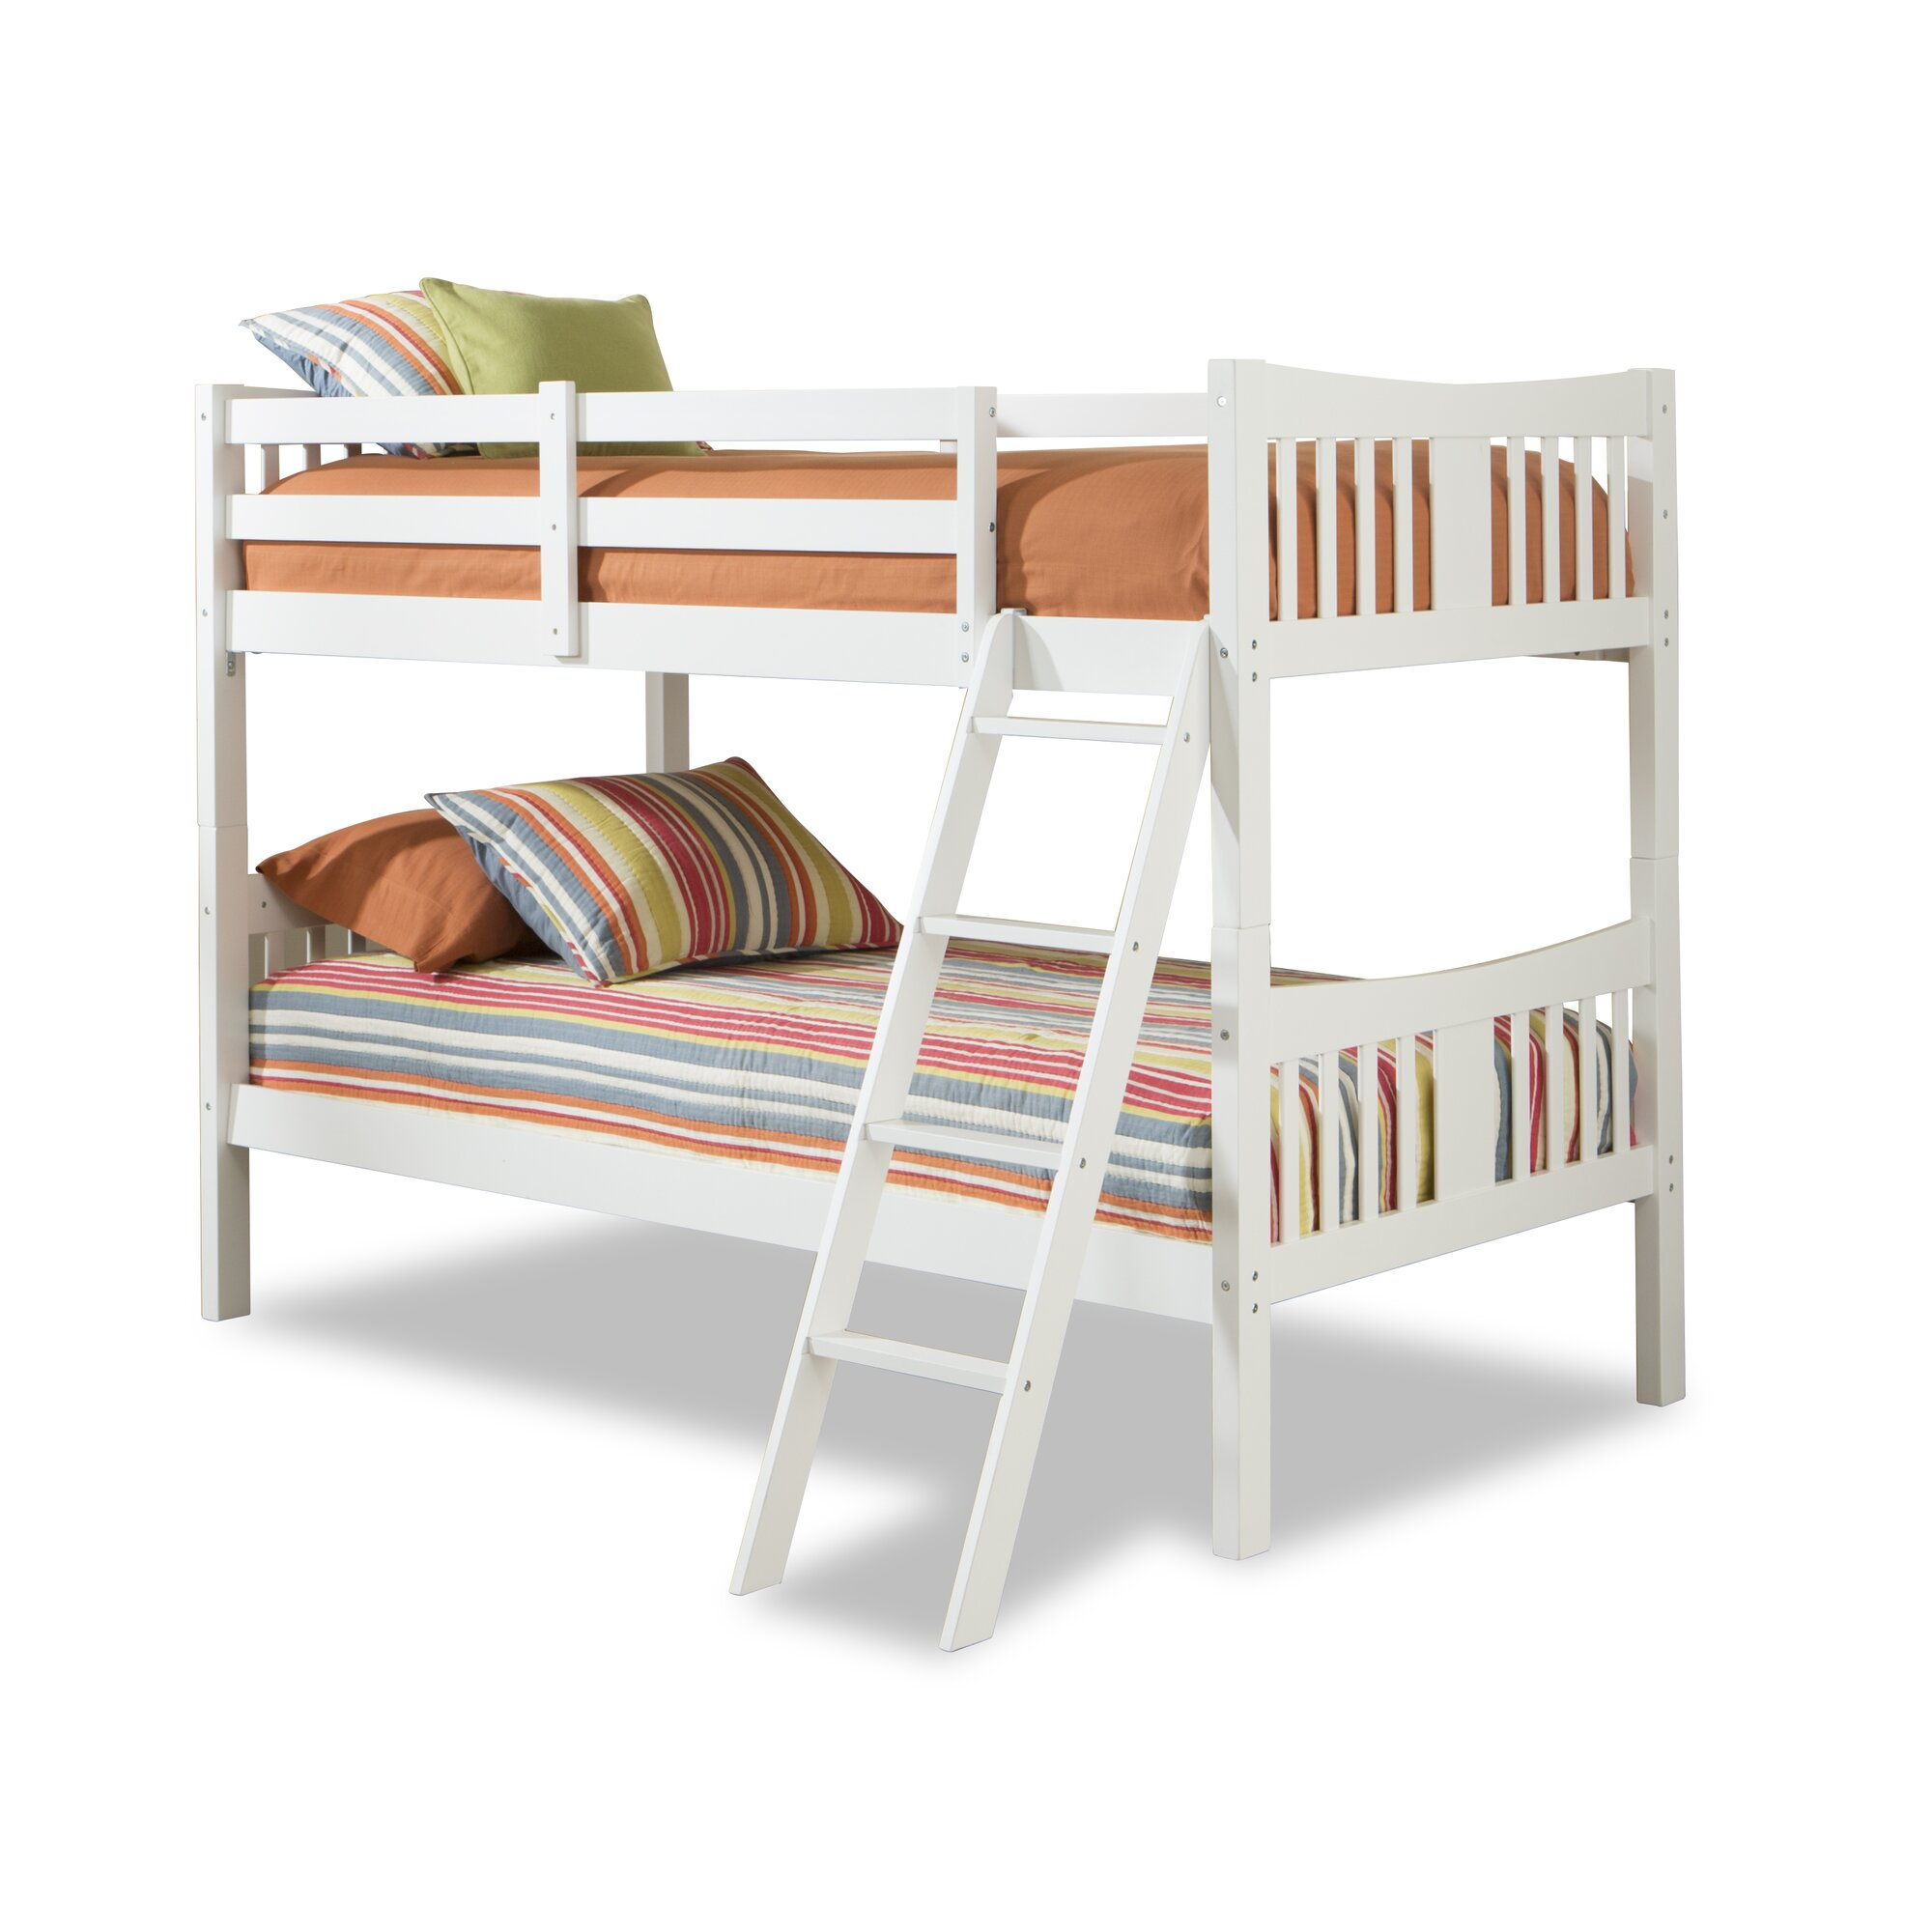 Storkcraft caribou solid hardwood twin bunk bed reviews for Stork craft caribou bunk bed